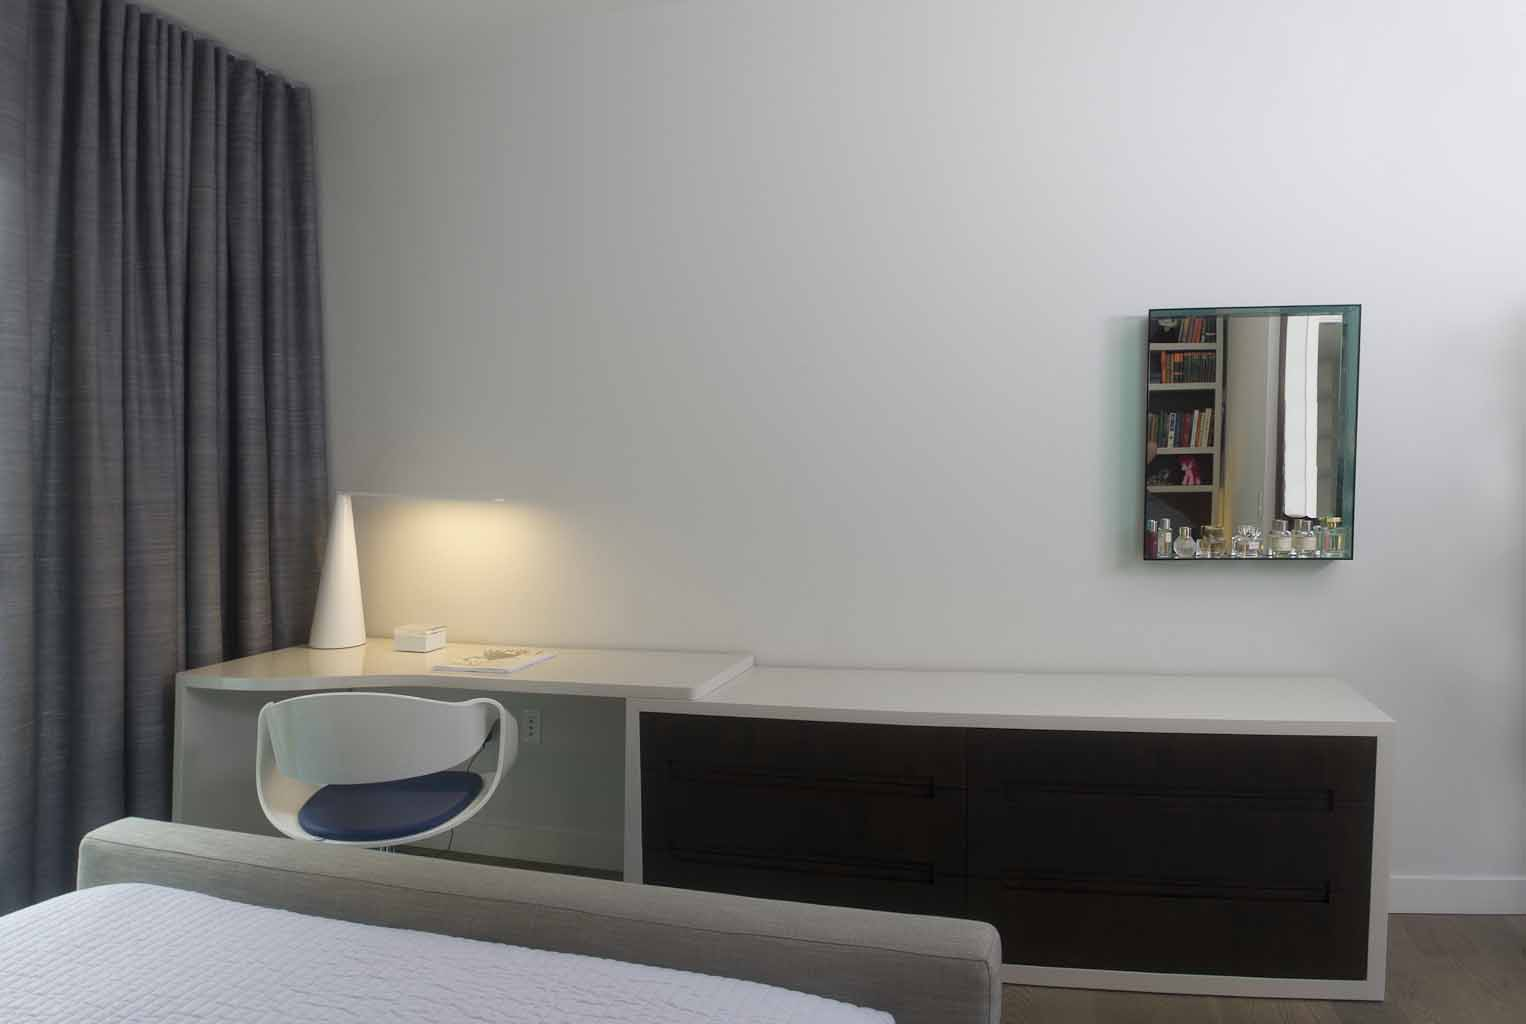 Bedroom 2 anorama 300web.JPG